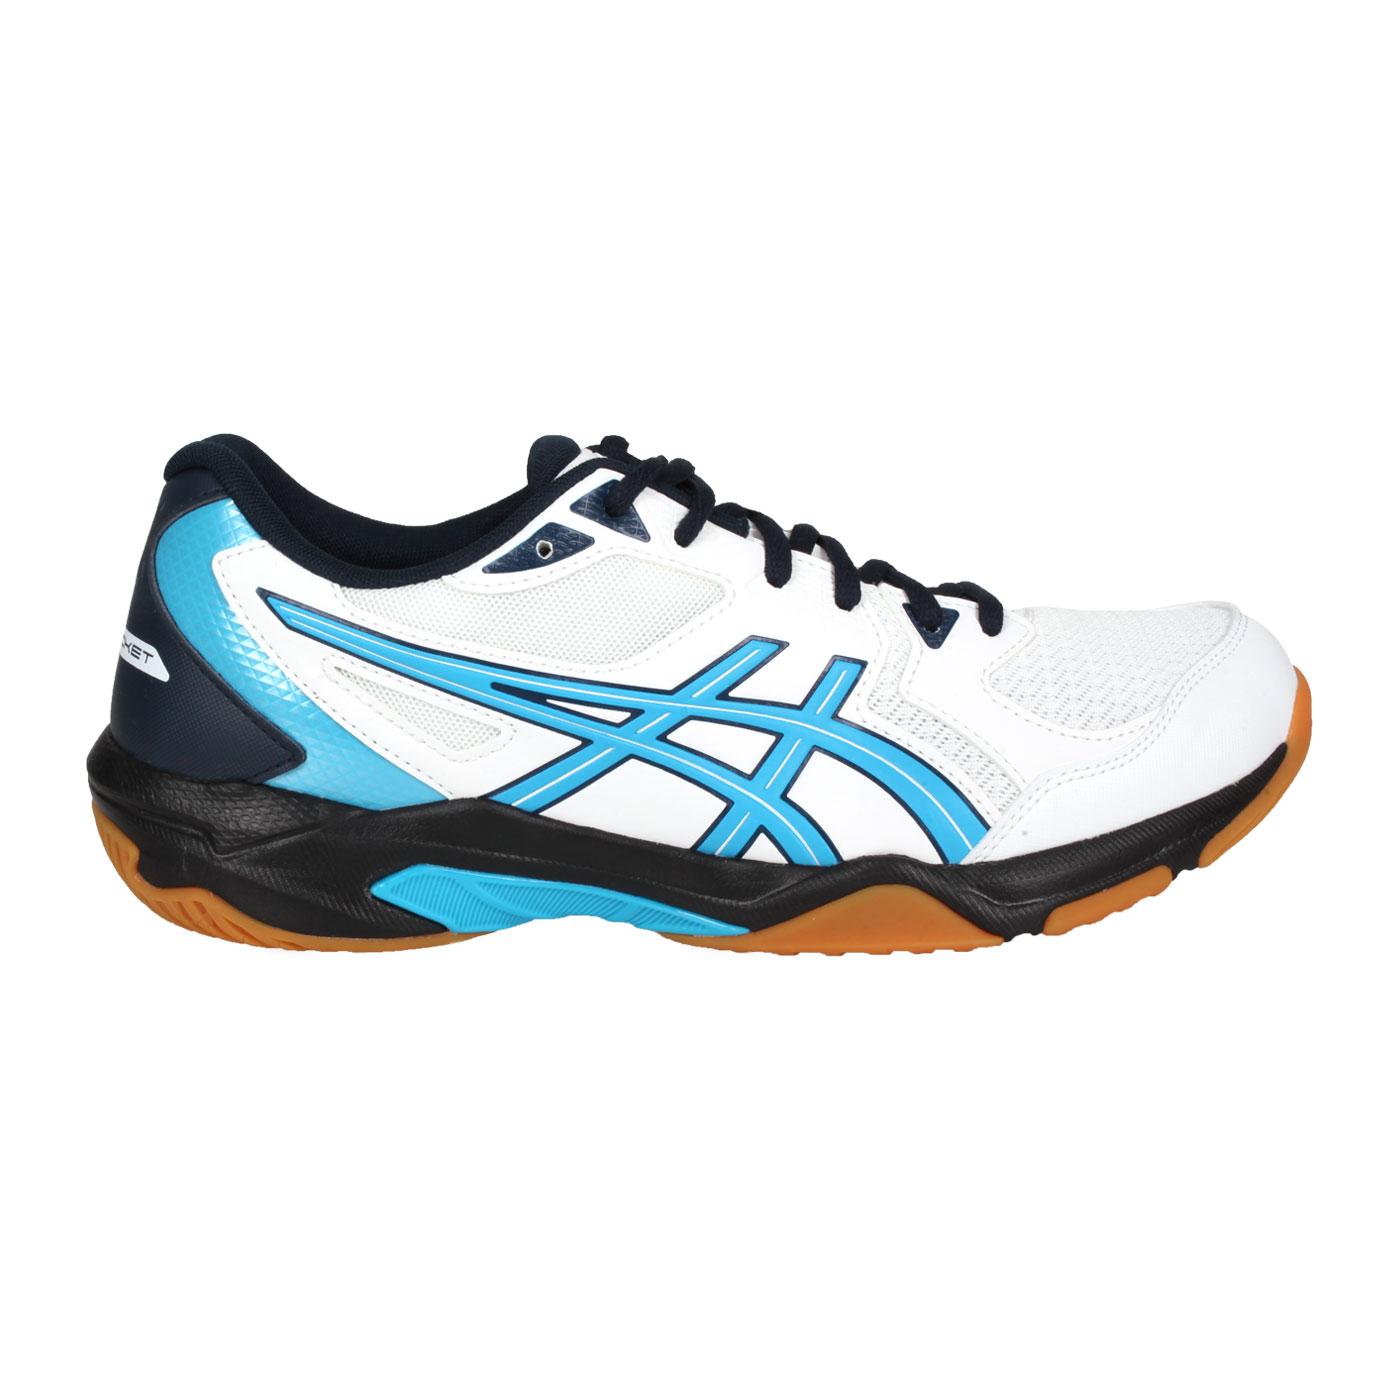 ASICS 男款排羽球鞋  @GEL-ROCKET 10@1071A054-102 - 白藍黑